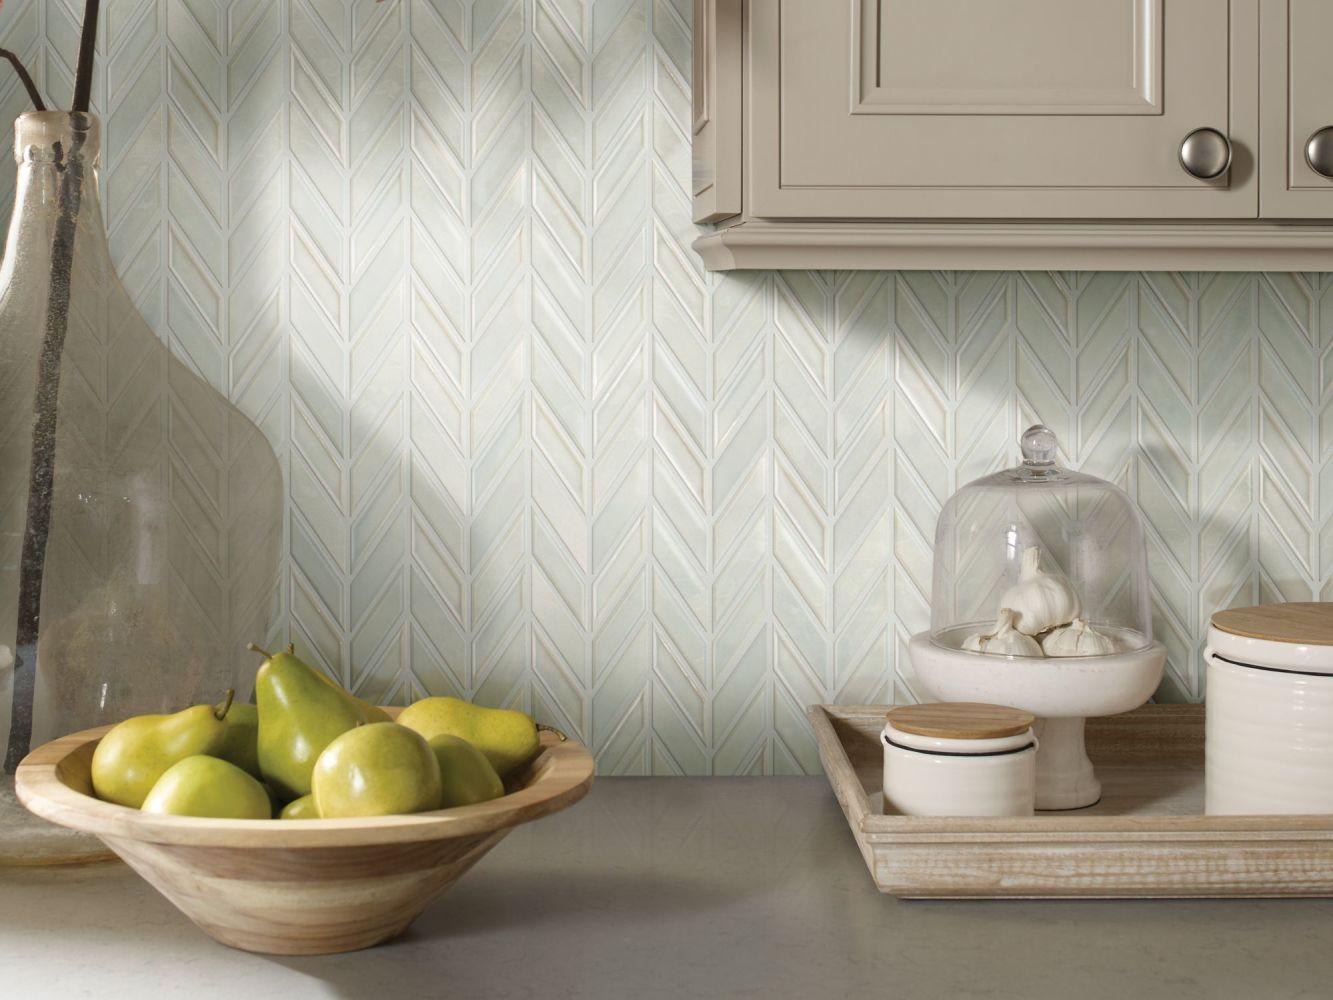 Shaw Floors Home Fn Gold Ceramic Geoscapes Chevron Bone 00150_TG46C